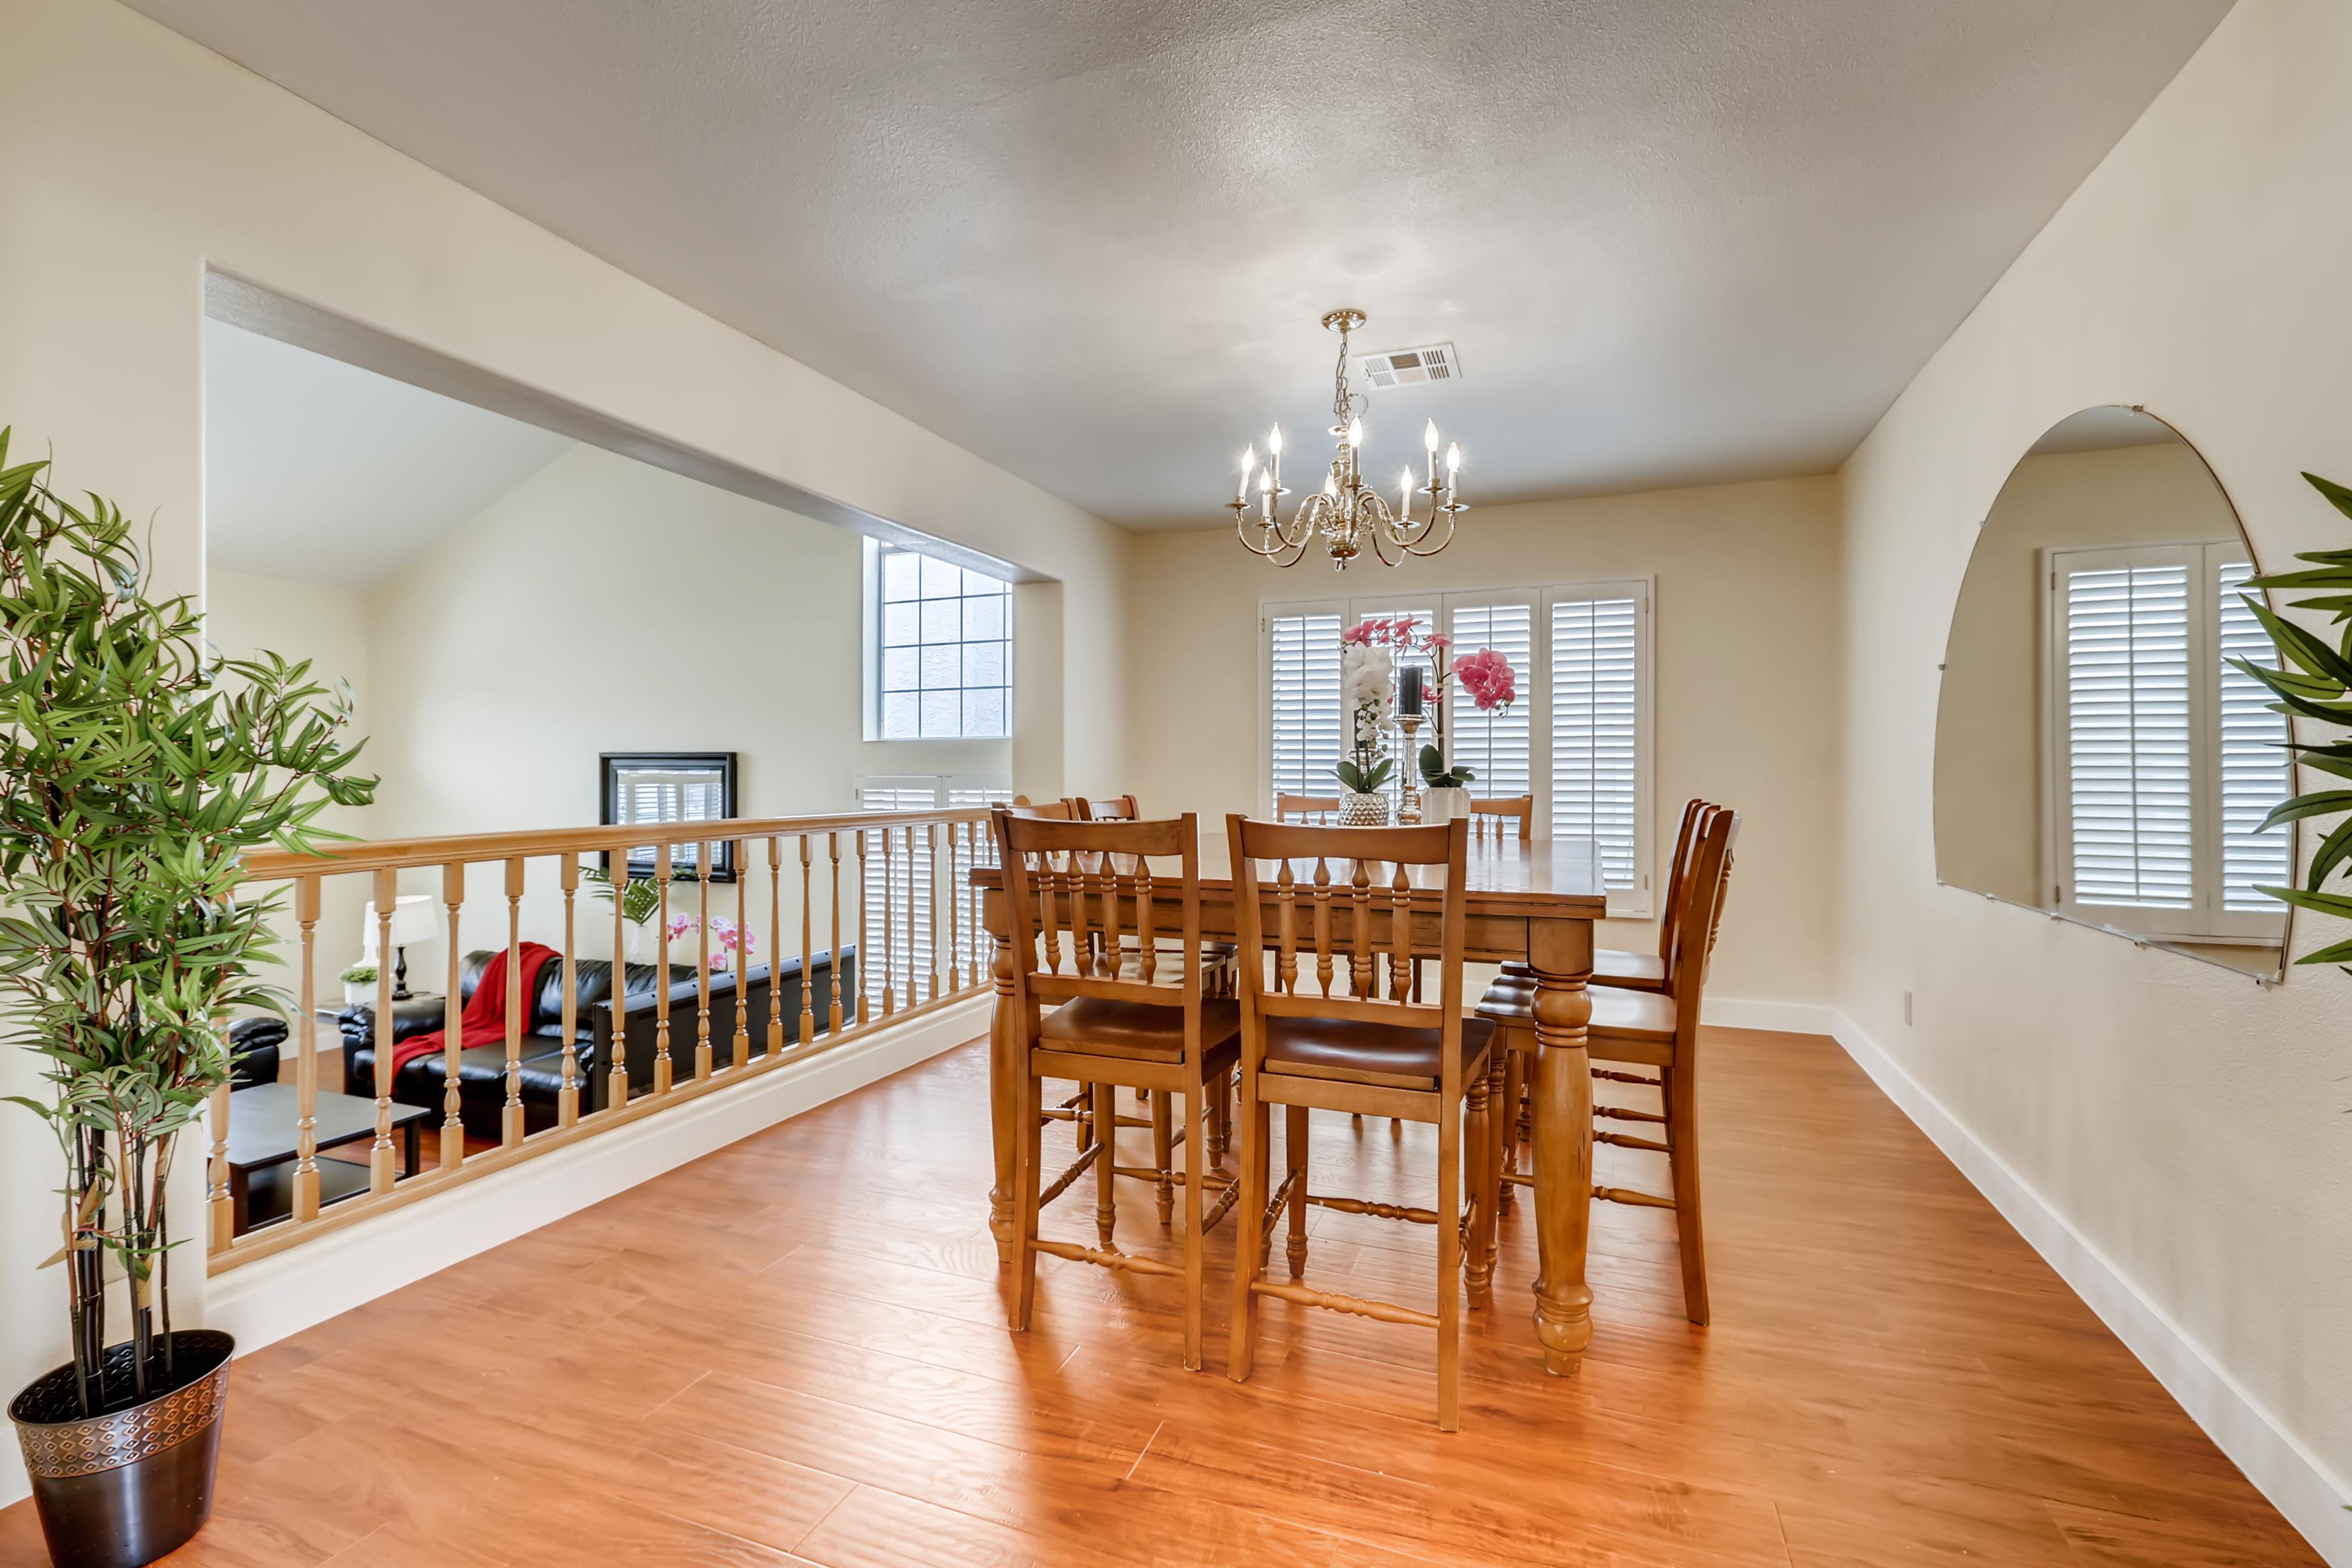 Joyful House Fit 12 Ppl Close To, Wetherburn Laminate Flooring